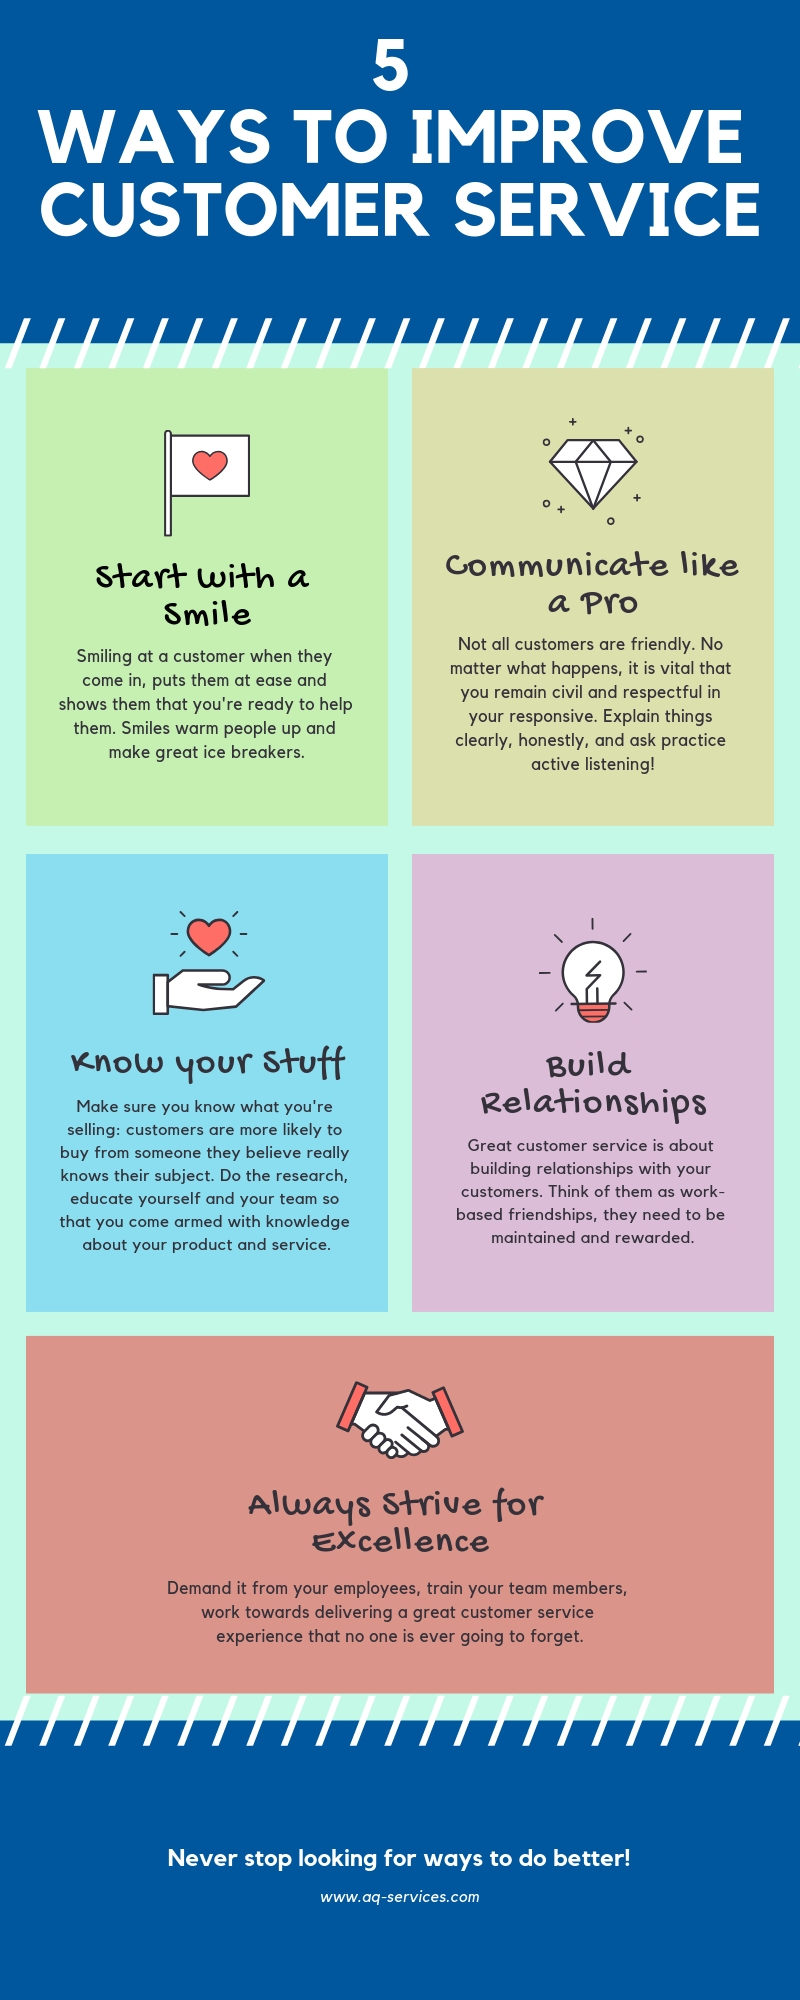 Ways to Improve Customer Service